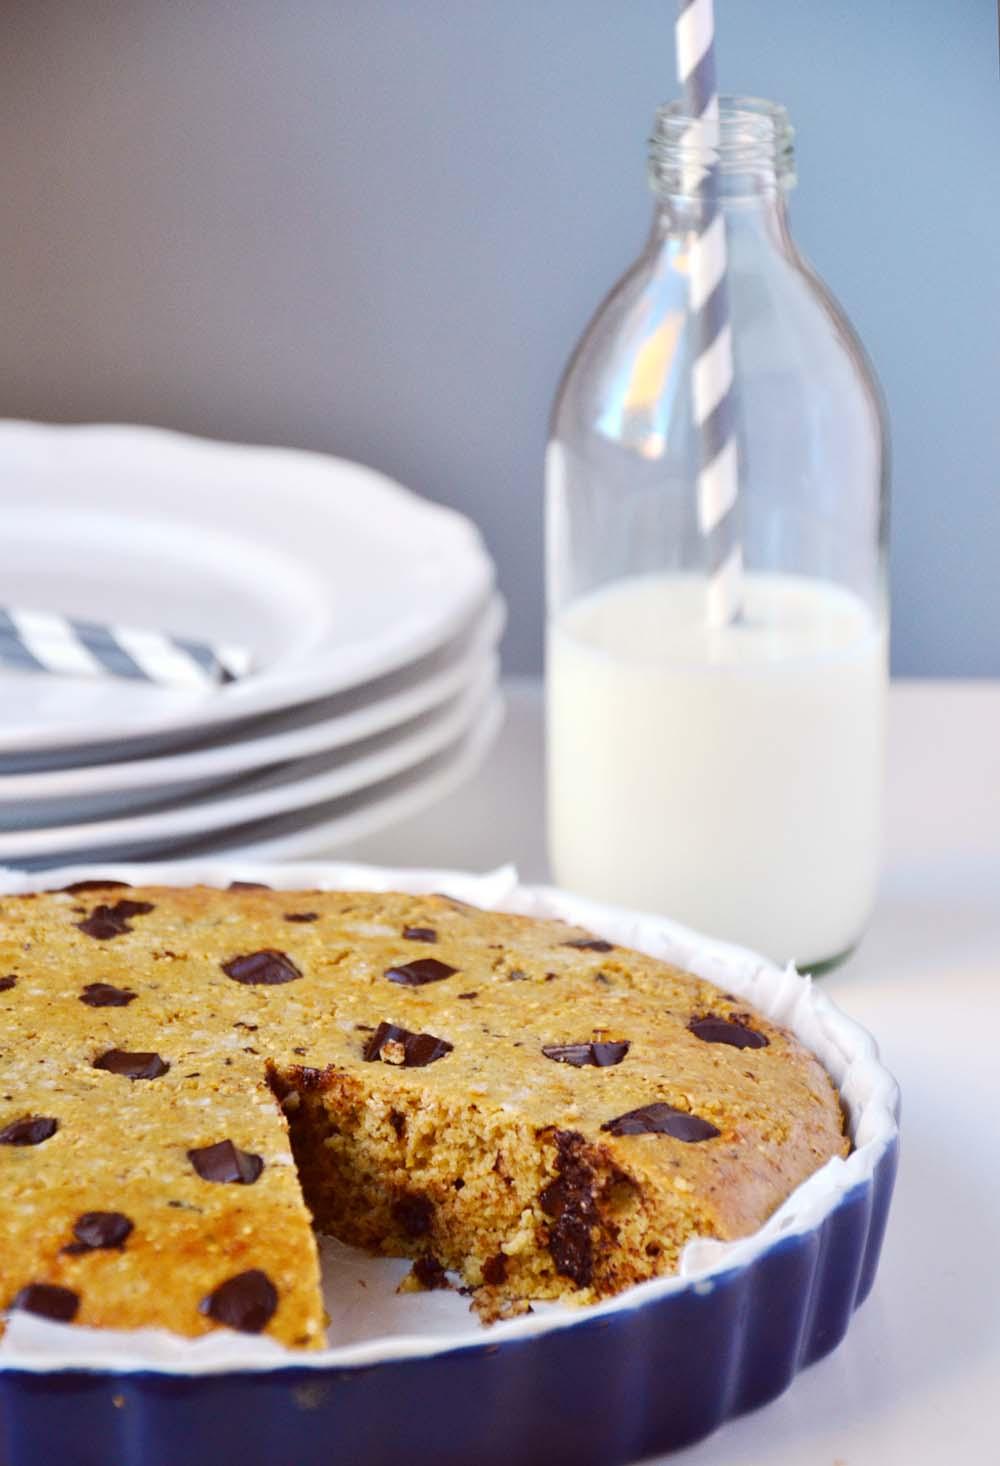 Chocolate chip skillet cookie pie